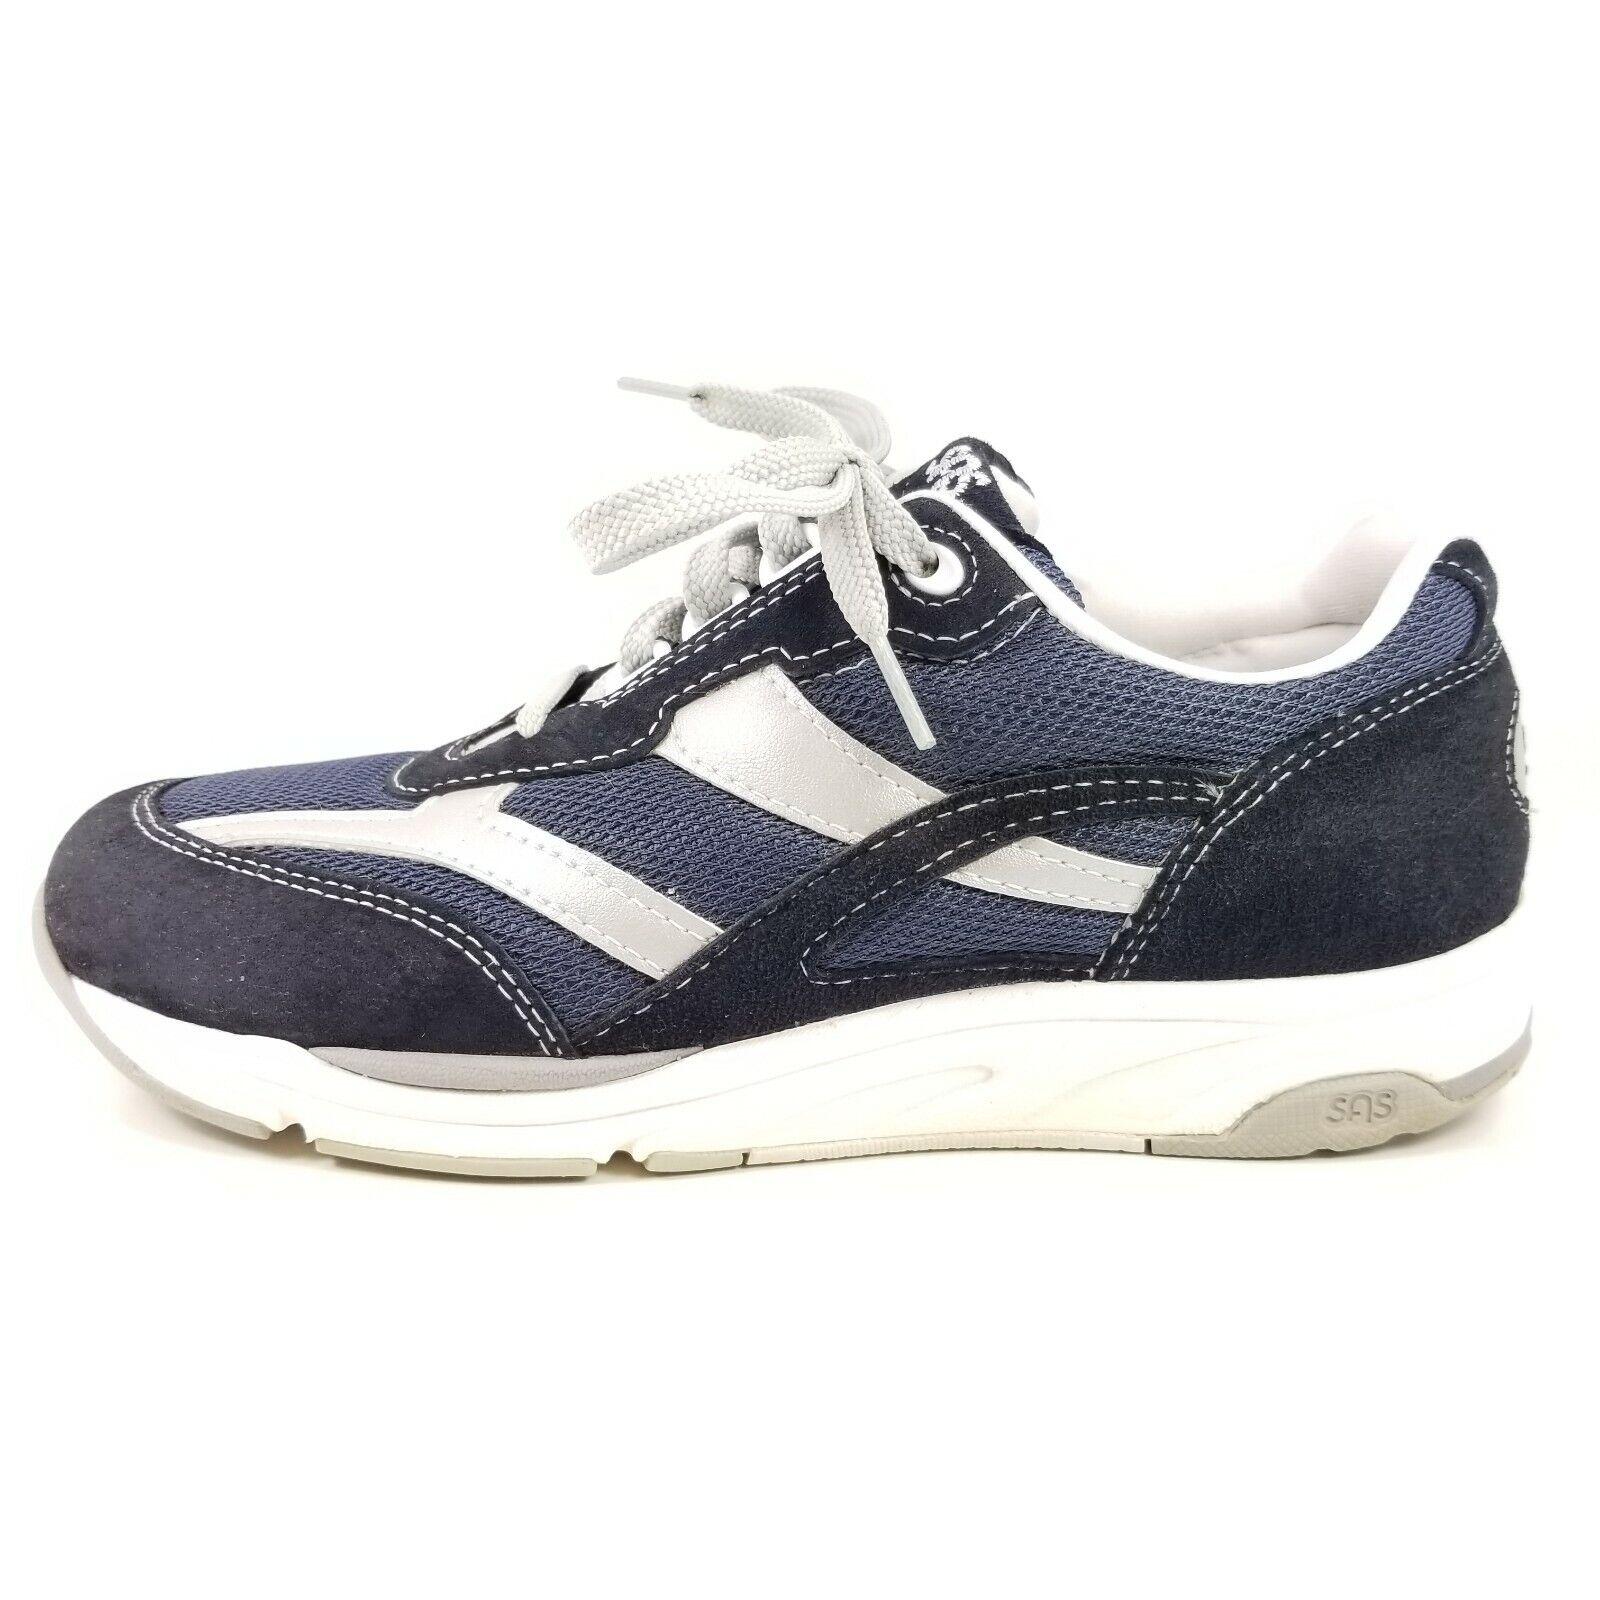 SAS Journey Mesh Sneakers Leather Mens Walking shoes blueee Low Heel EUC Size 7 W